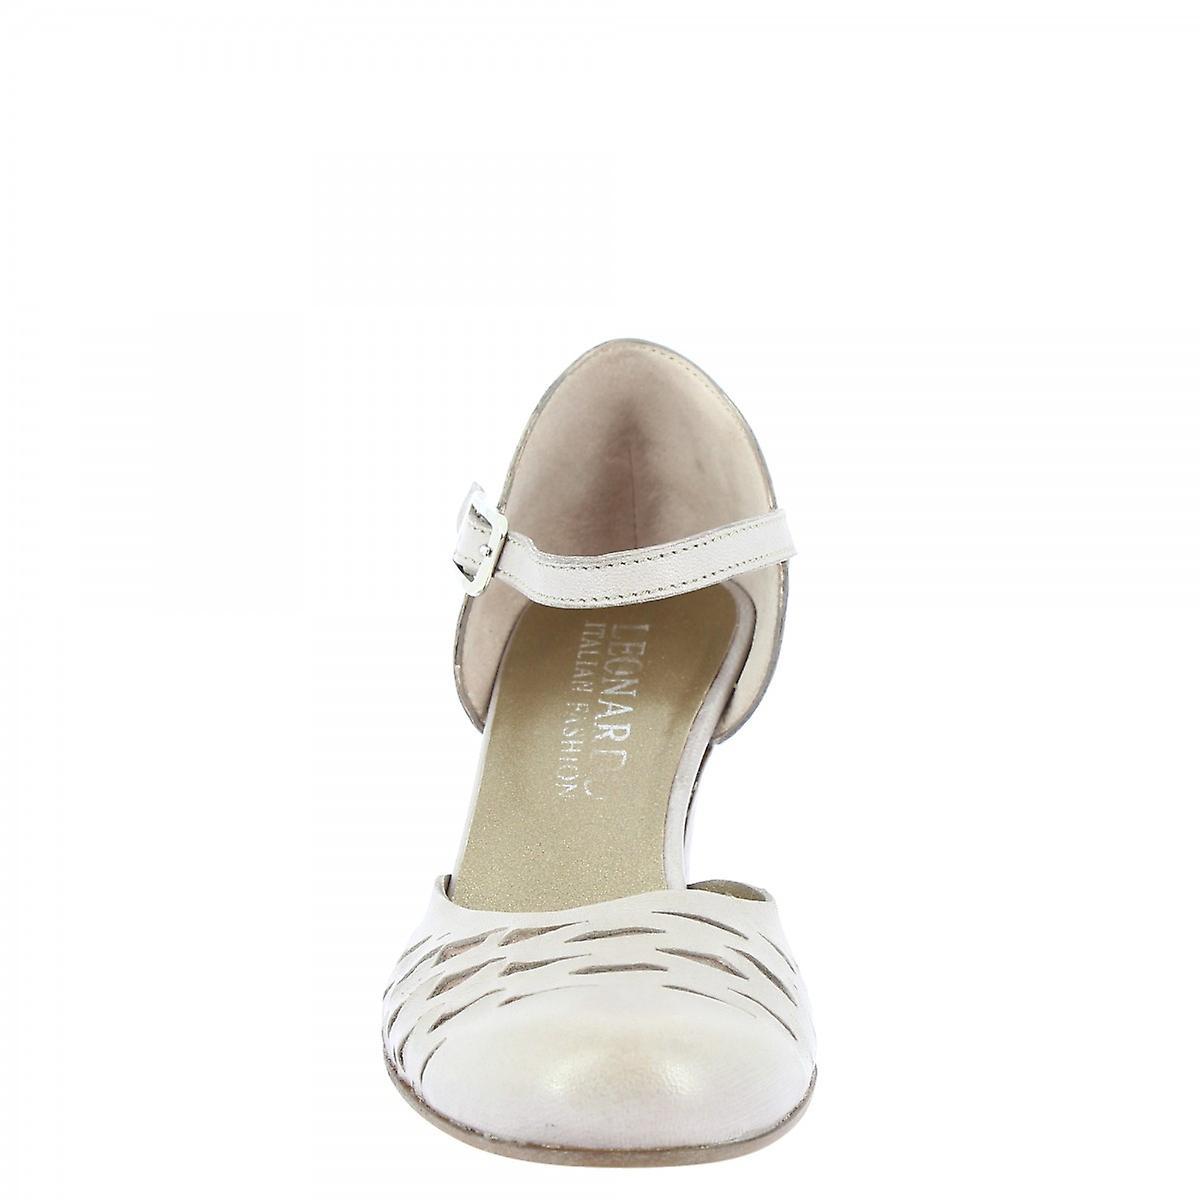 Leonardo Shoes Women's handmade dance mid heels pumps pearl gray napa leather